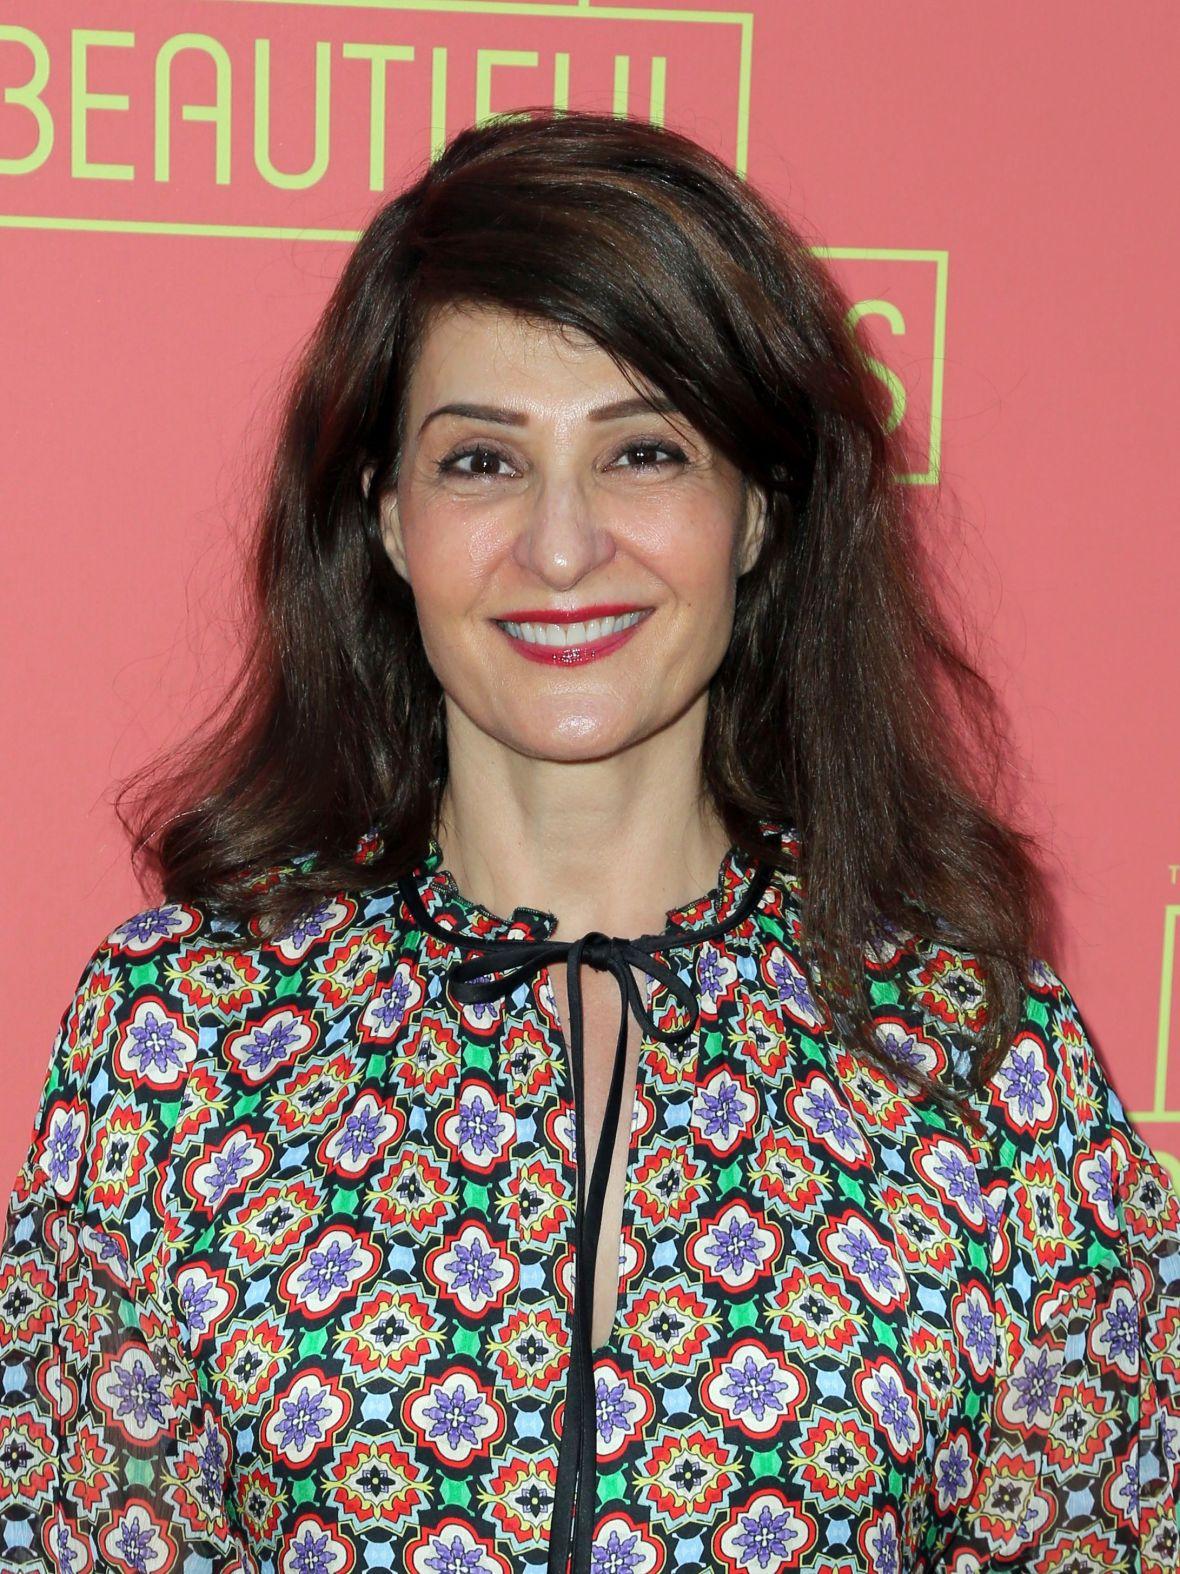 Nia Vardalos at the Opening Night of 'Tiny Beautiful Things'